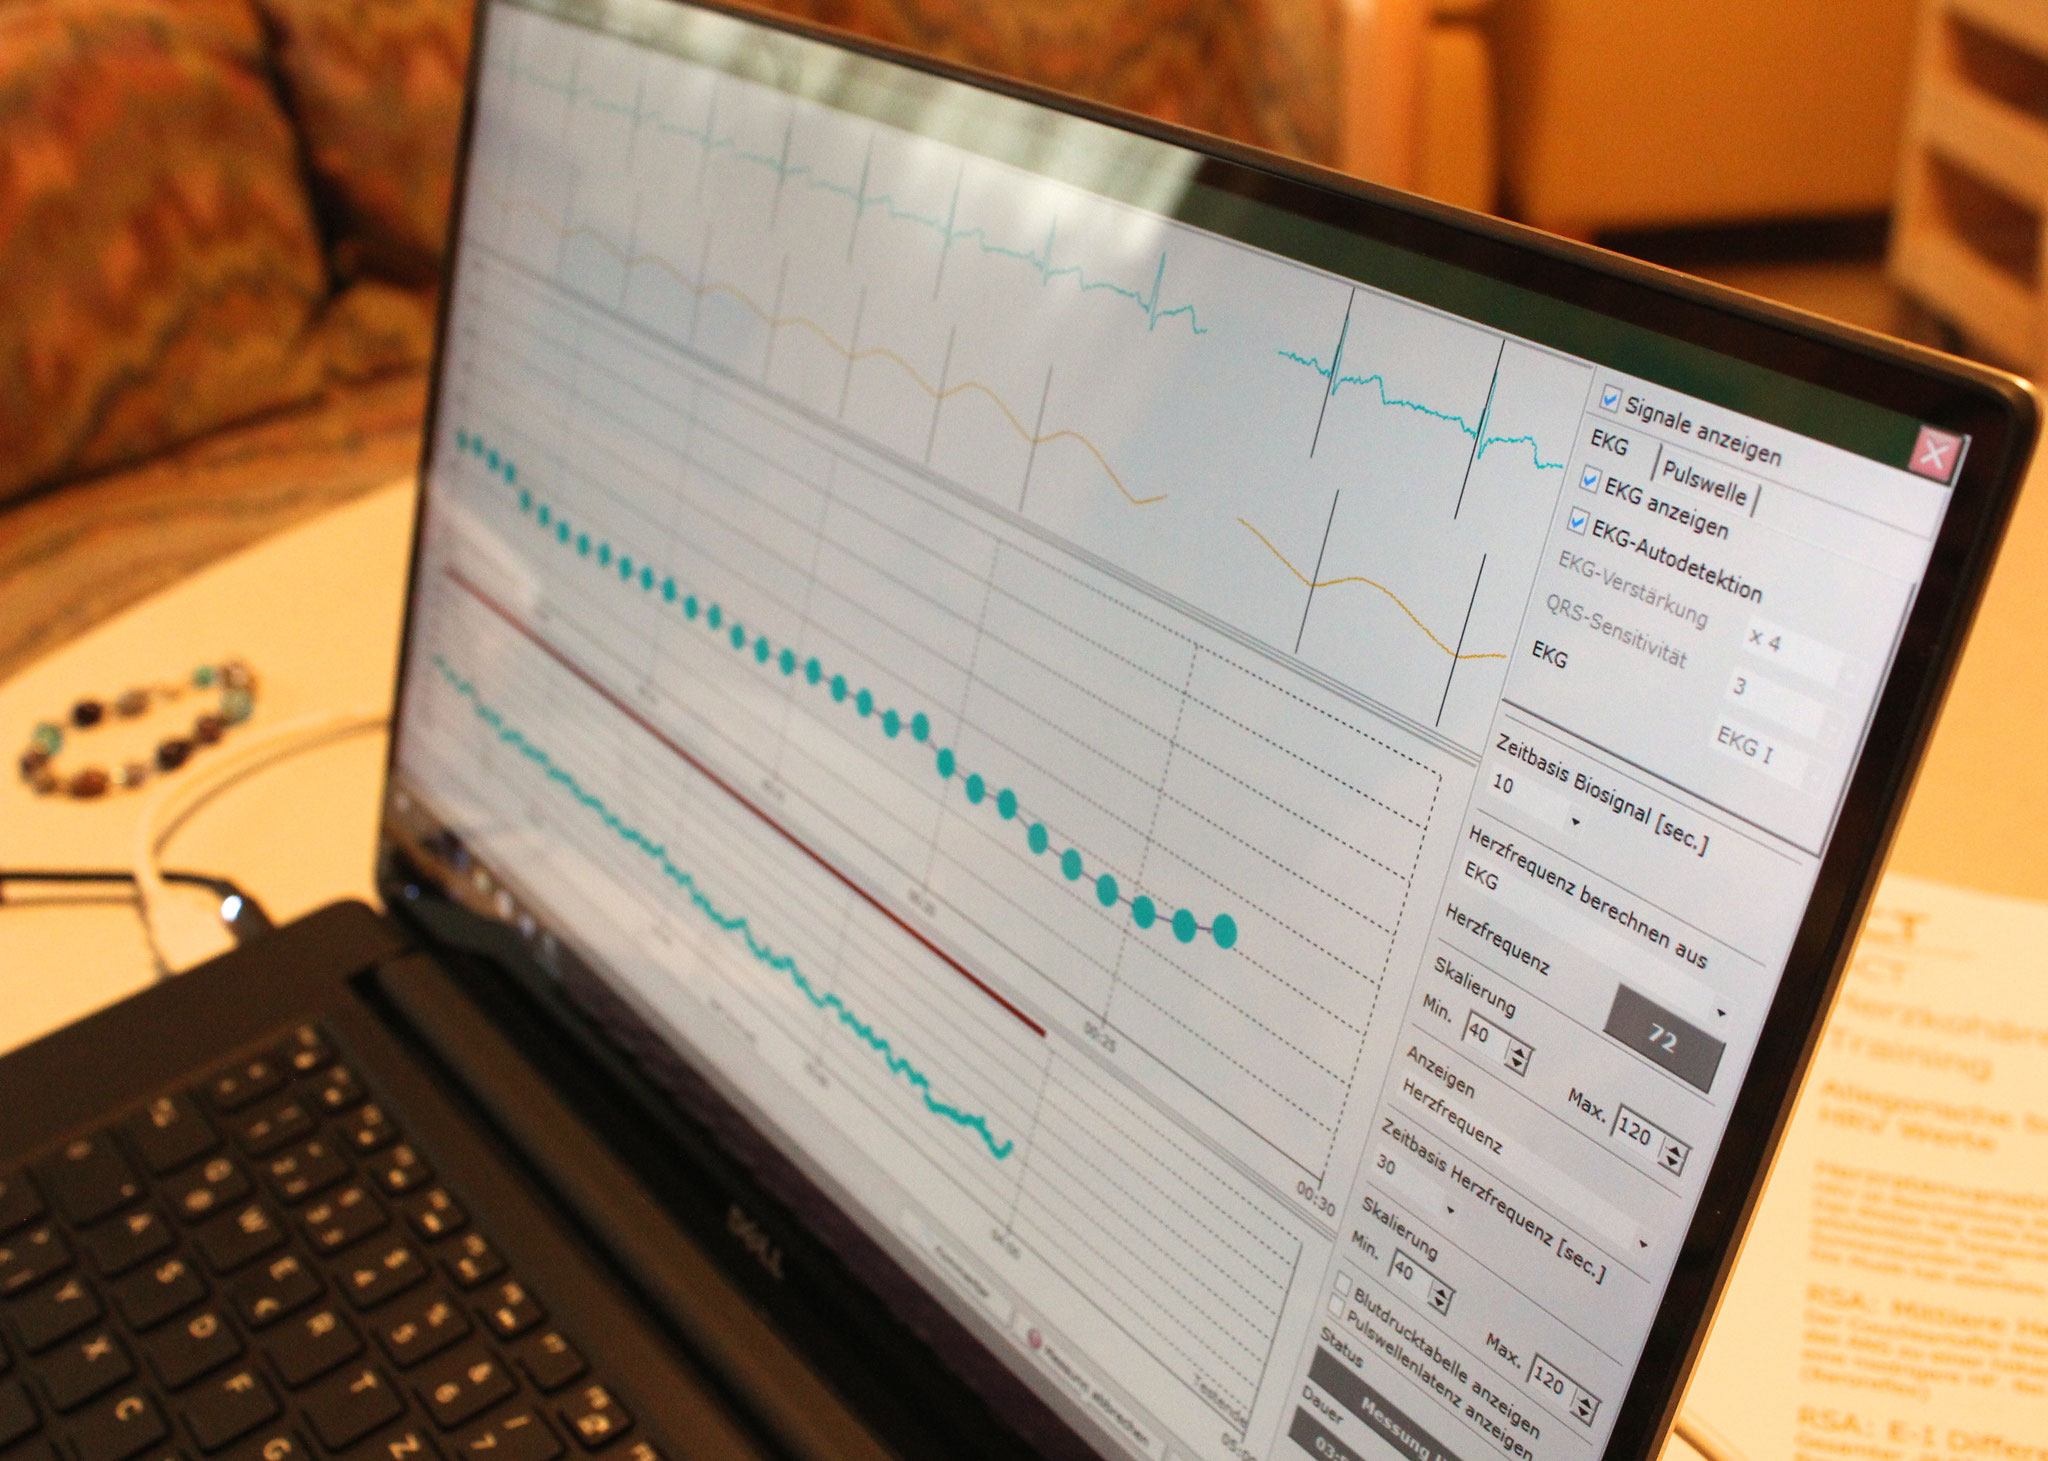 Biofeedback-Messung (HRV)